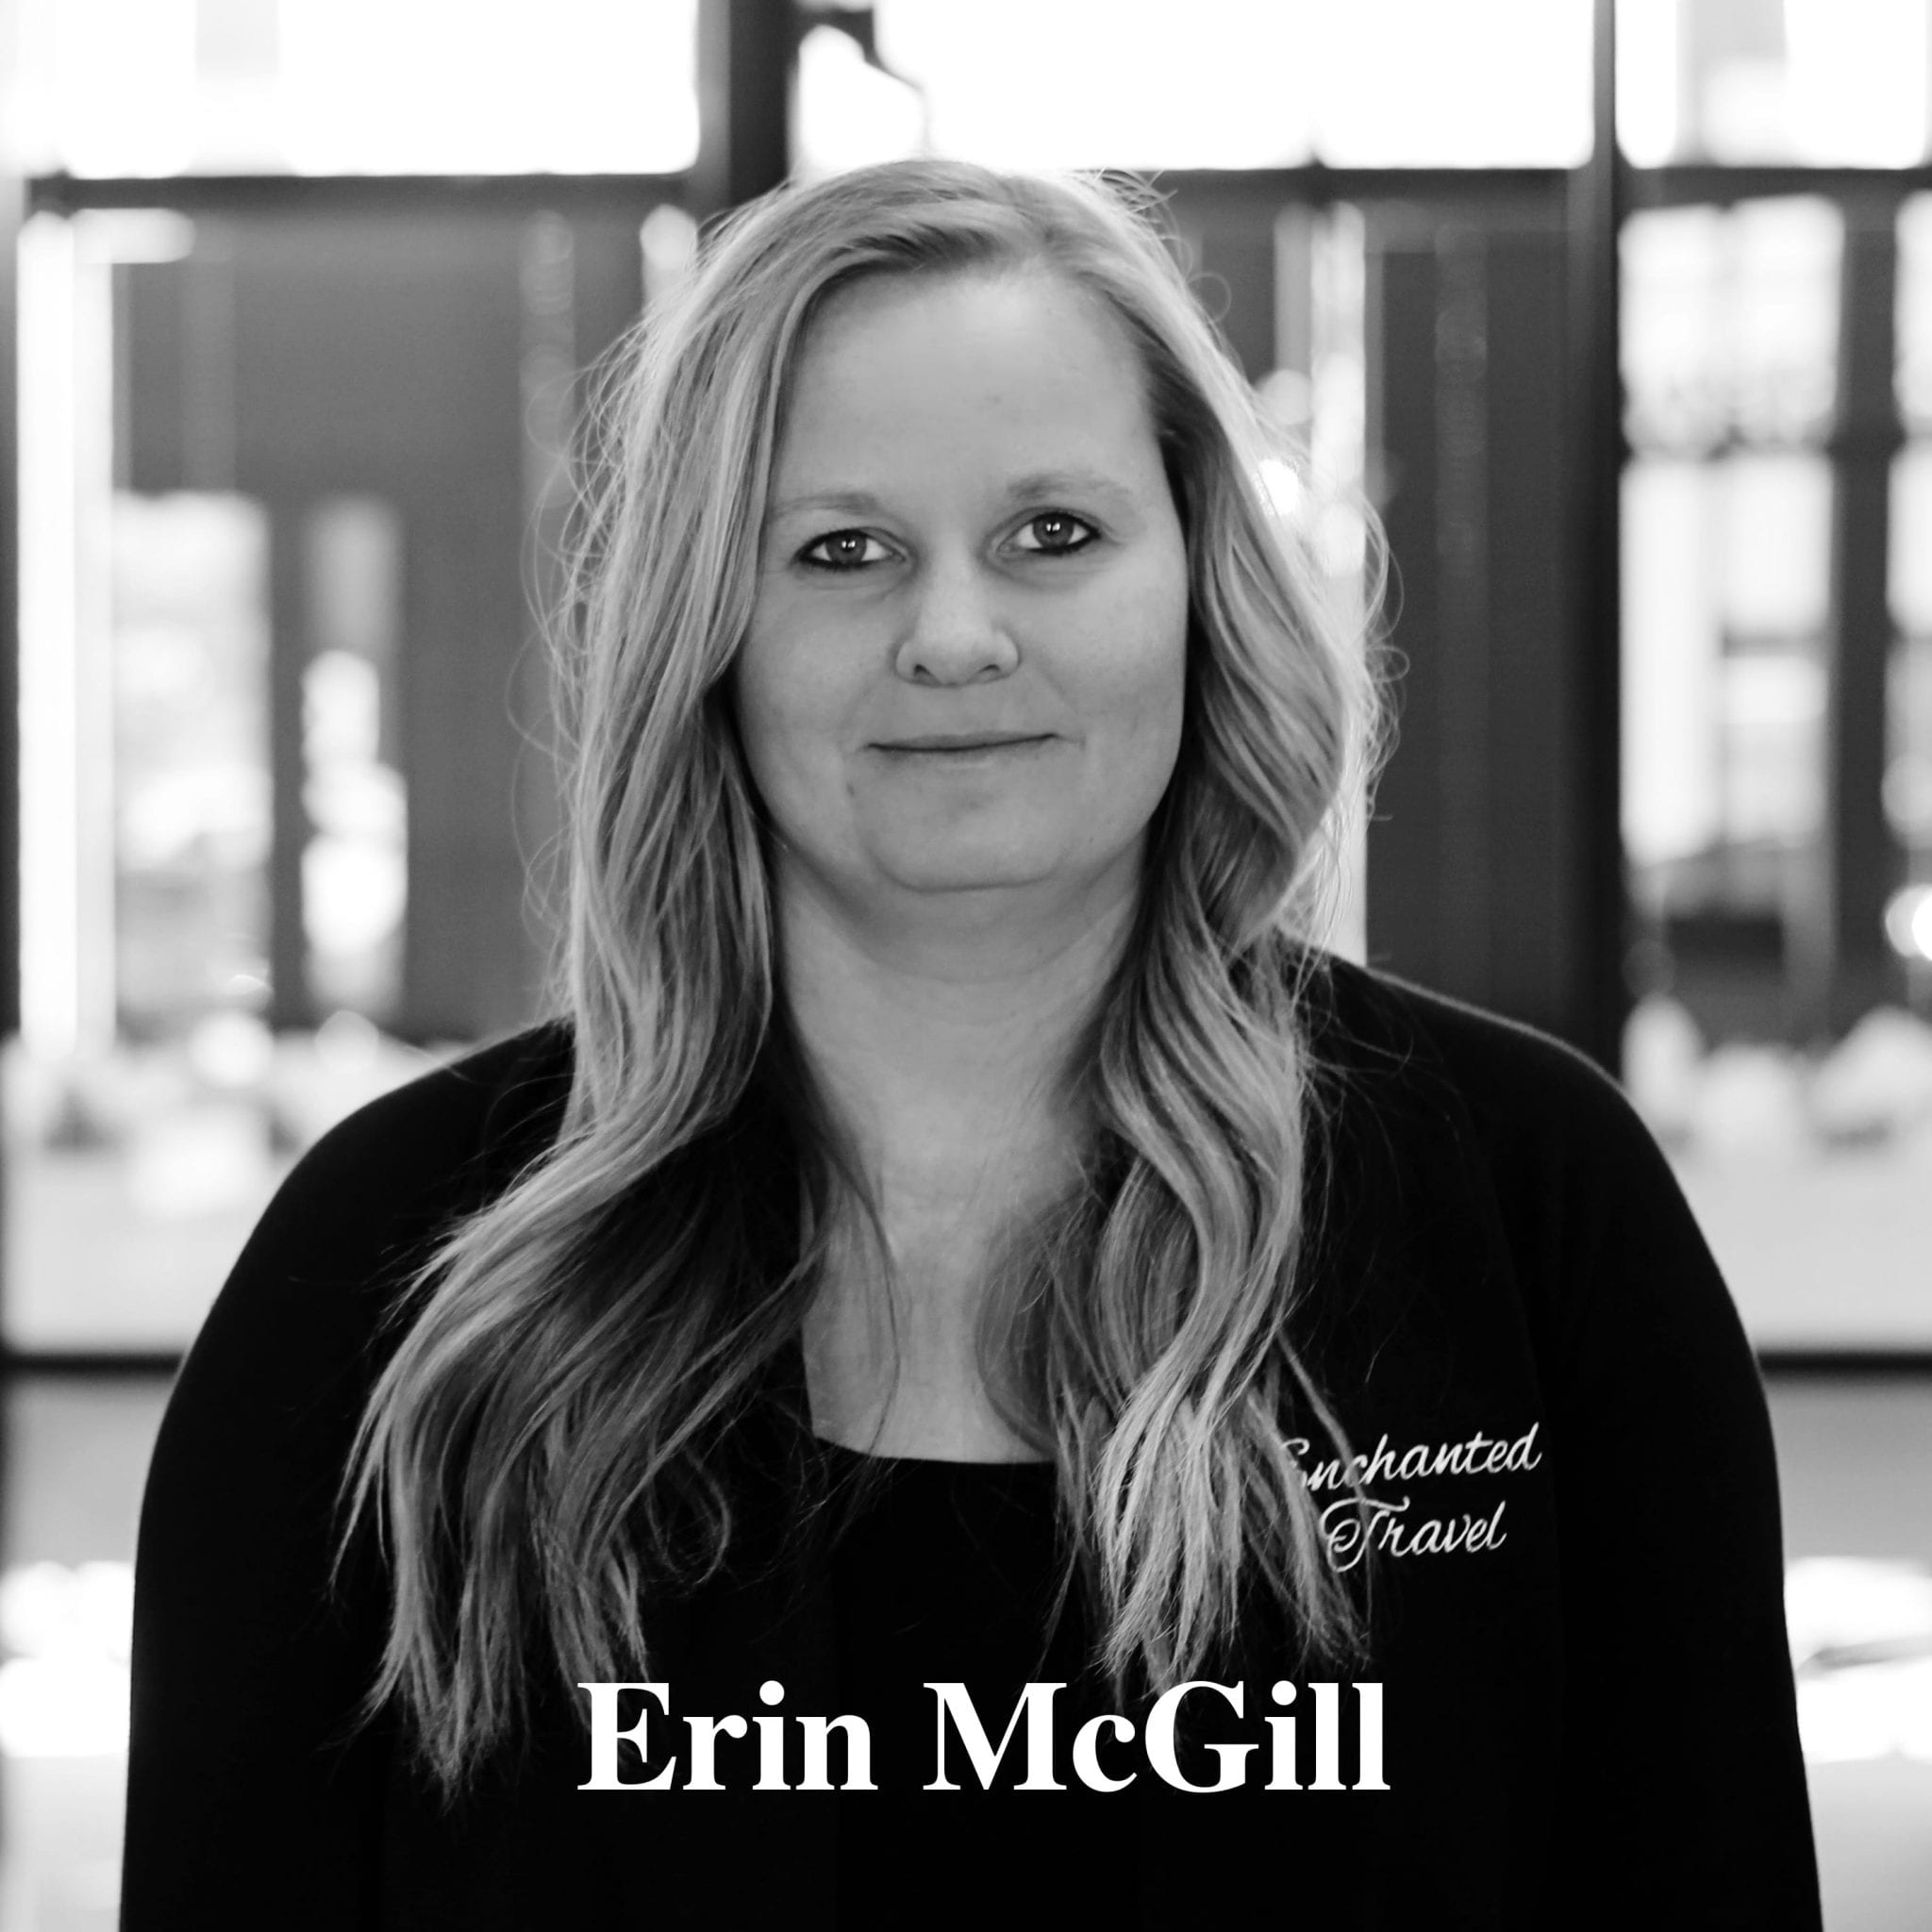 Erin McGill